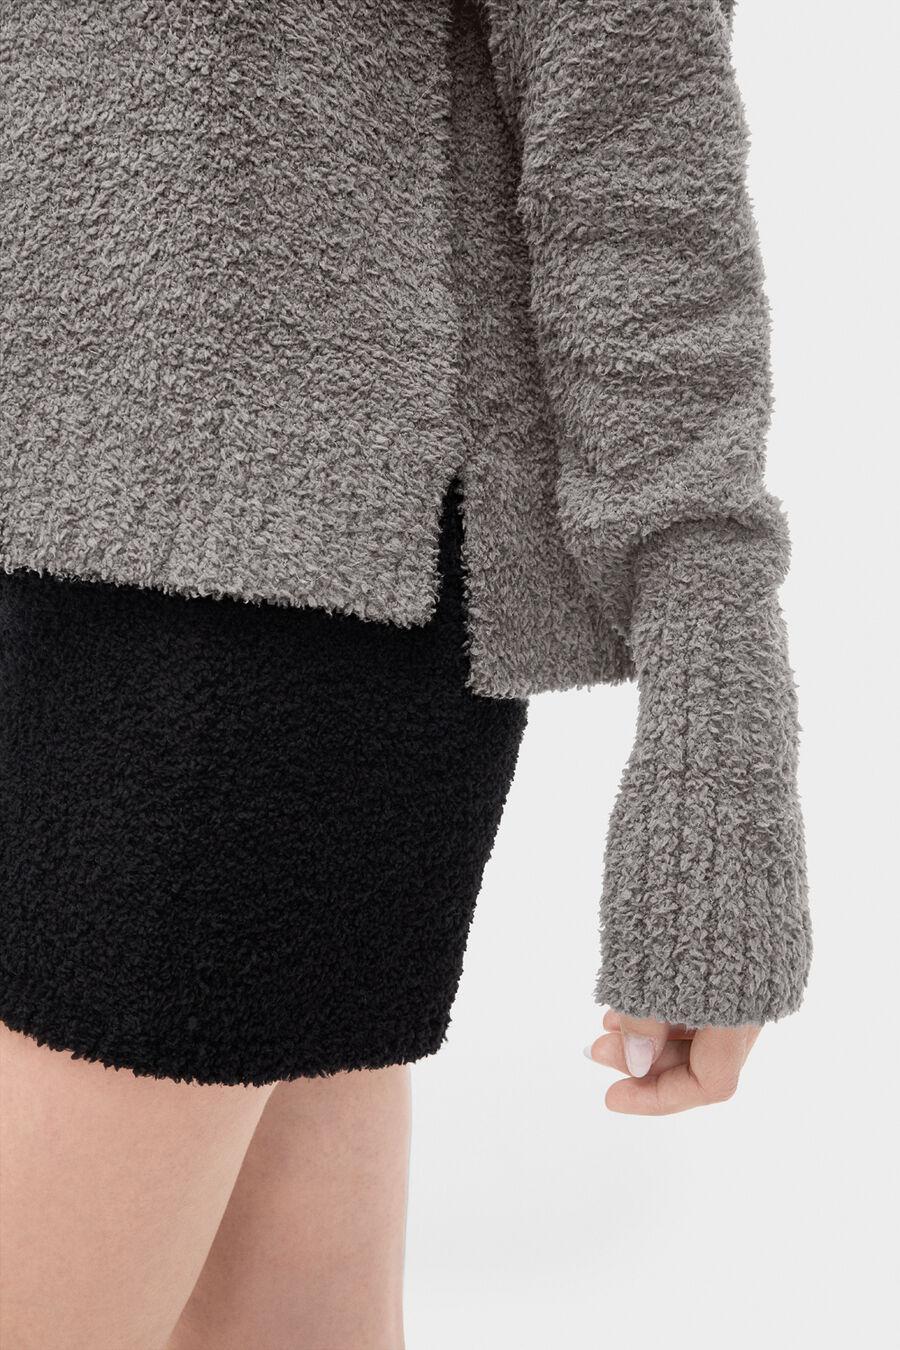 Sage Sweater - Image 5 of 5